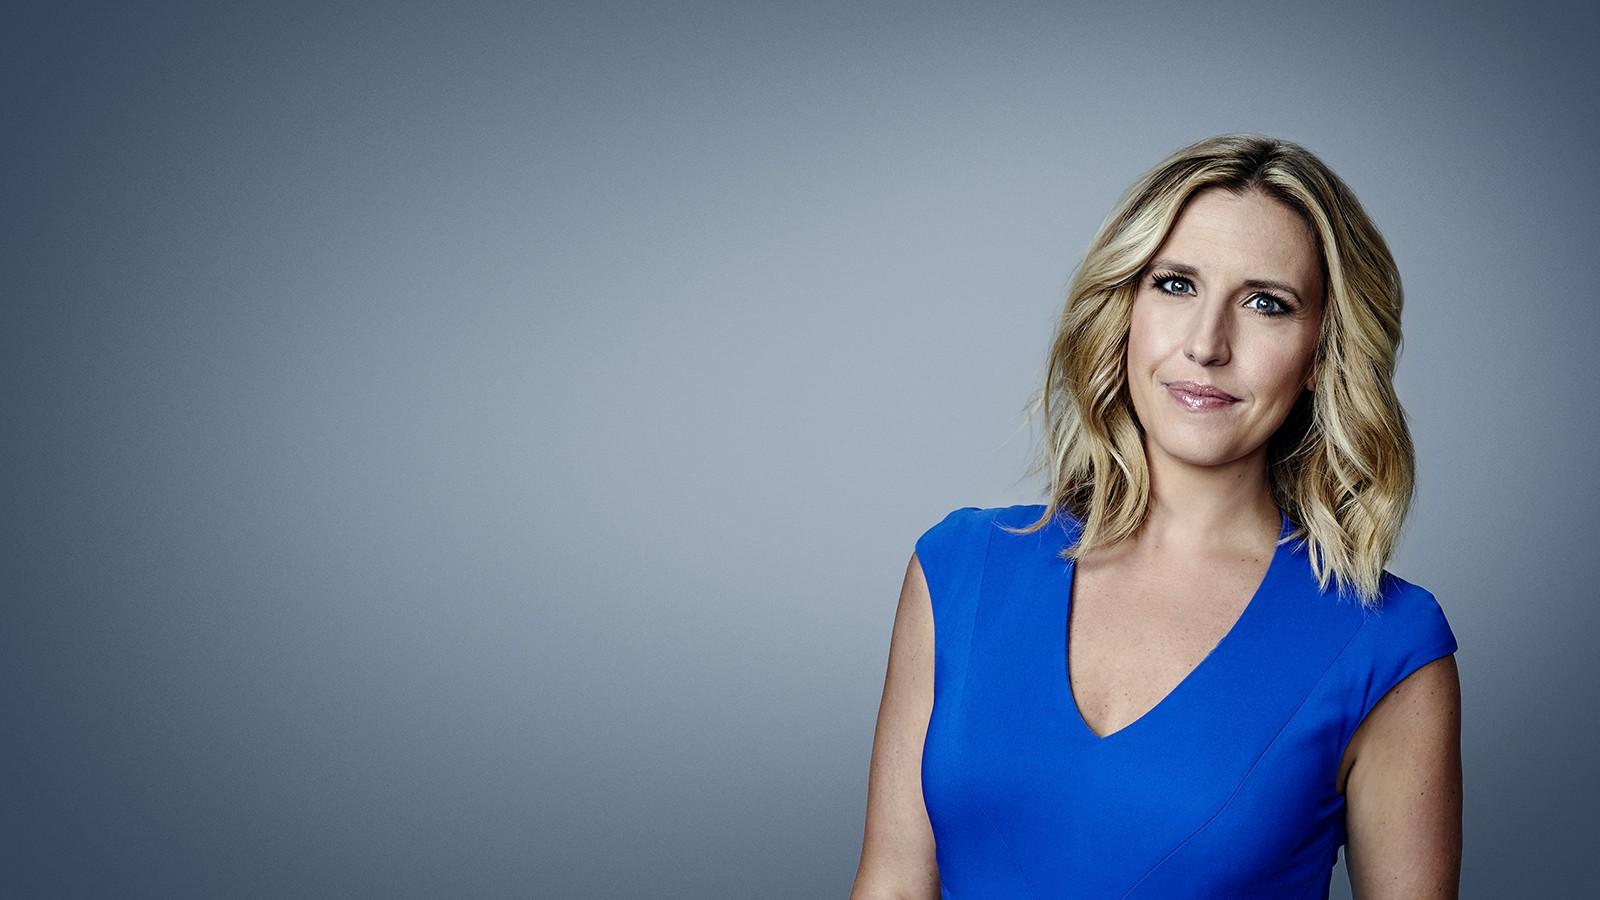 CNN Profiles - Poppy Harlow - Anchor, CNN Newsroom 9-11am ...